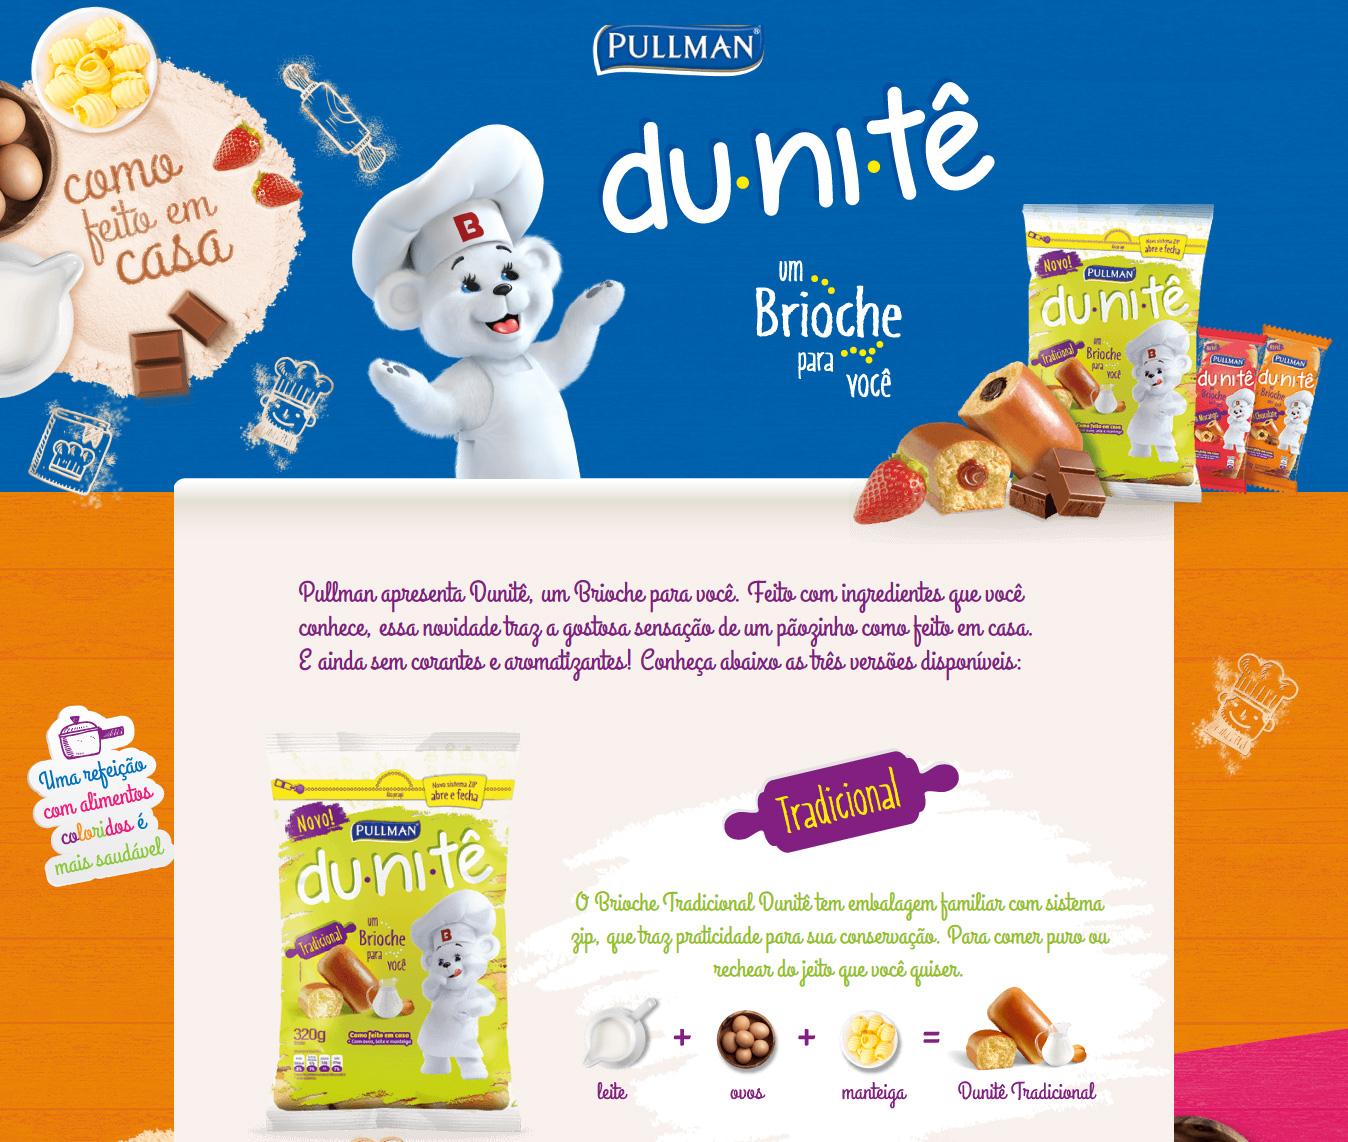 dunite